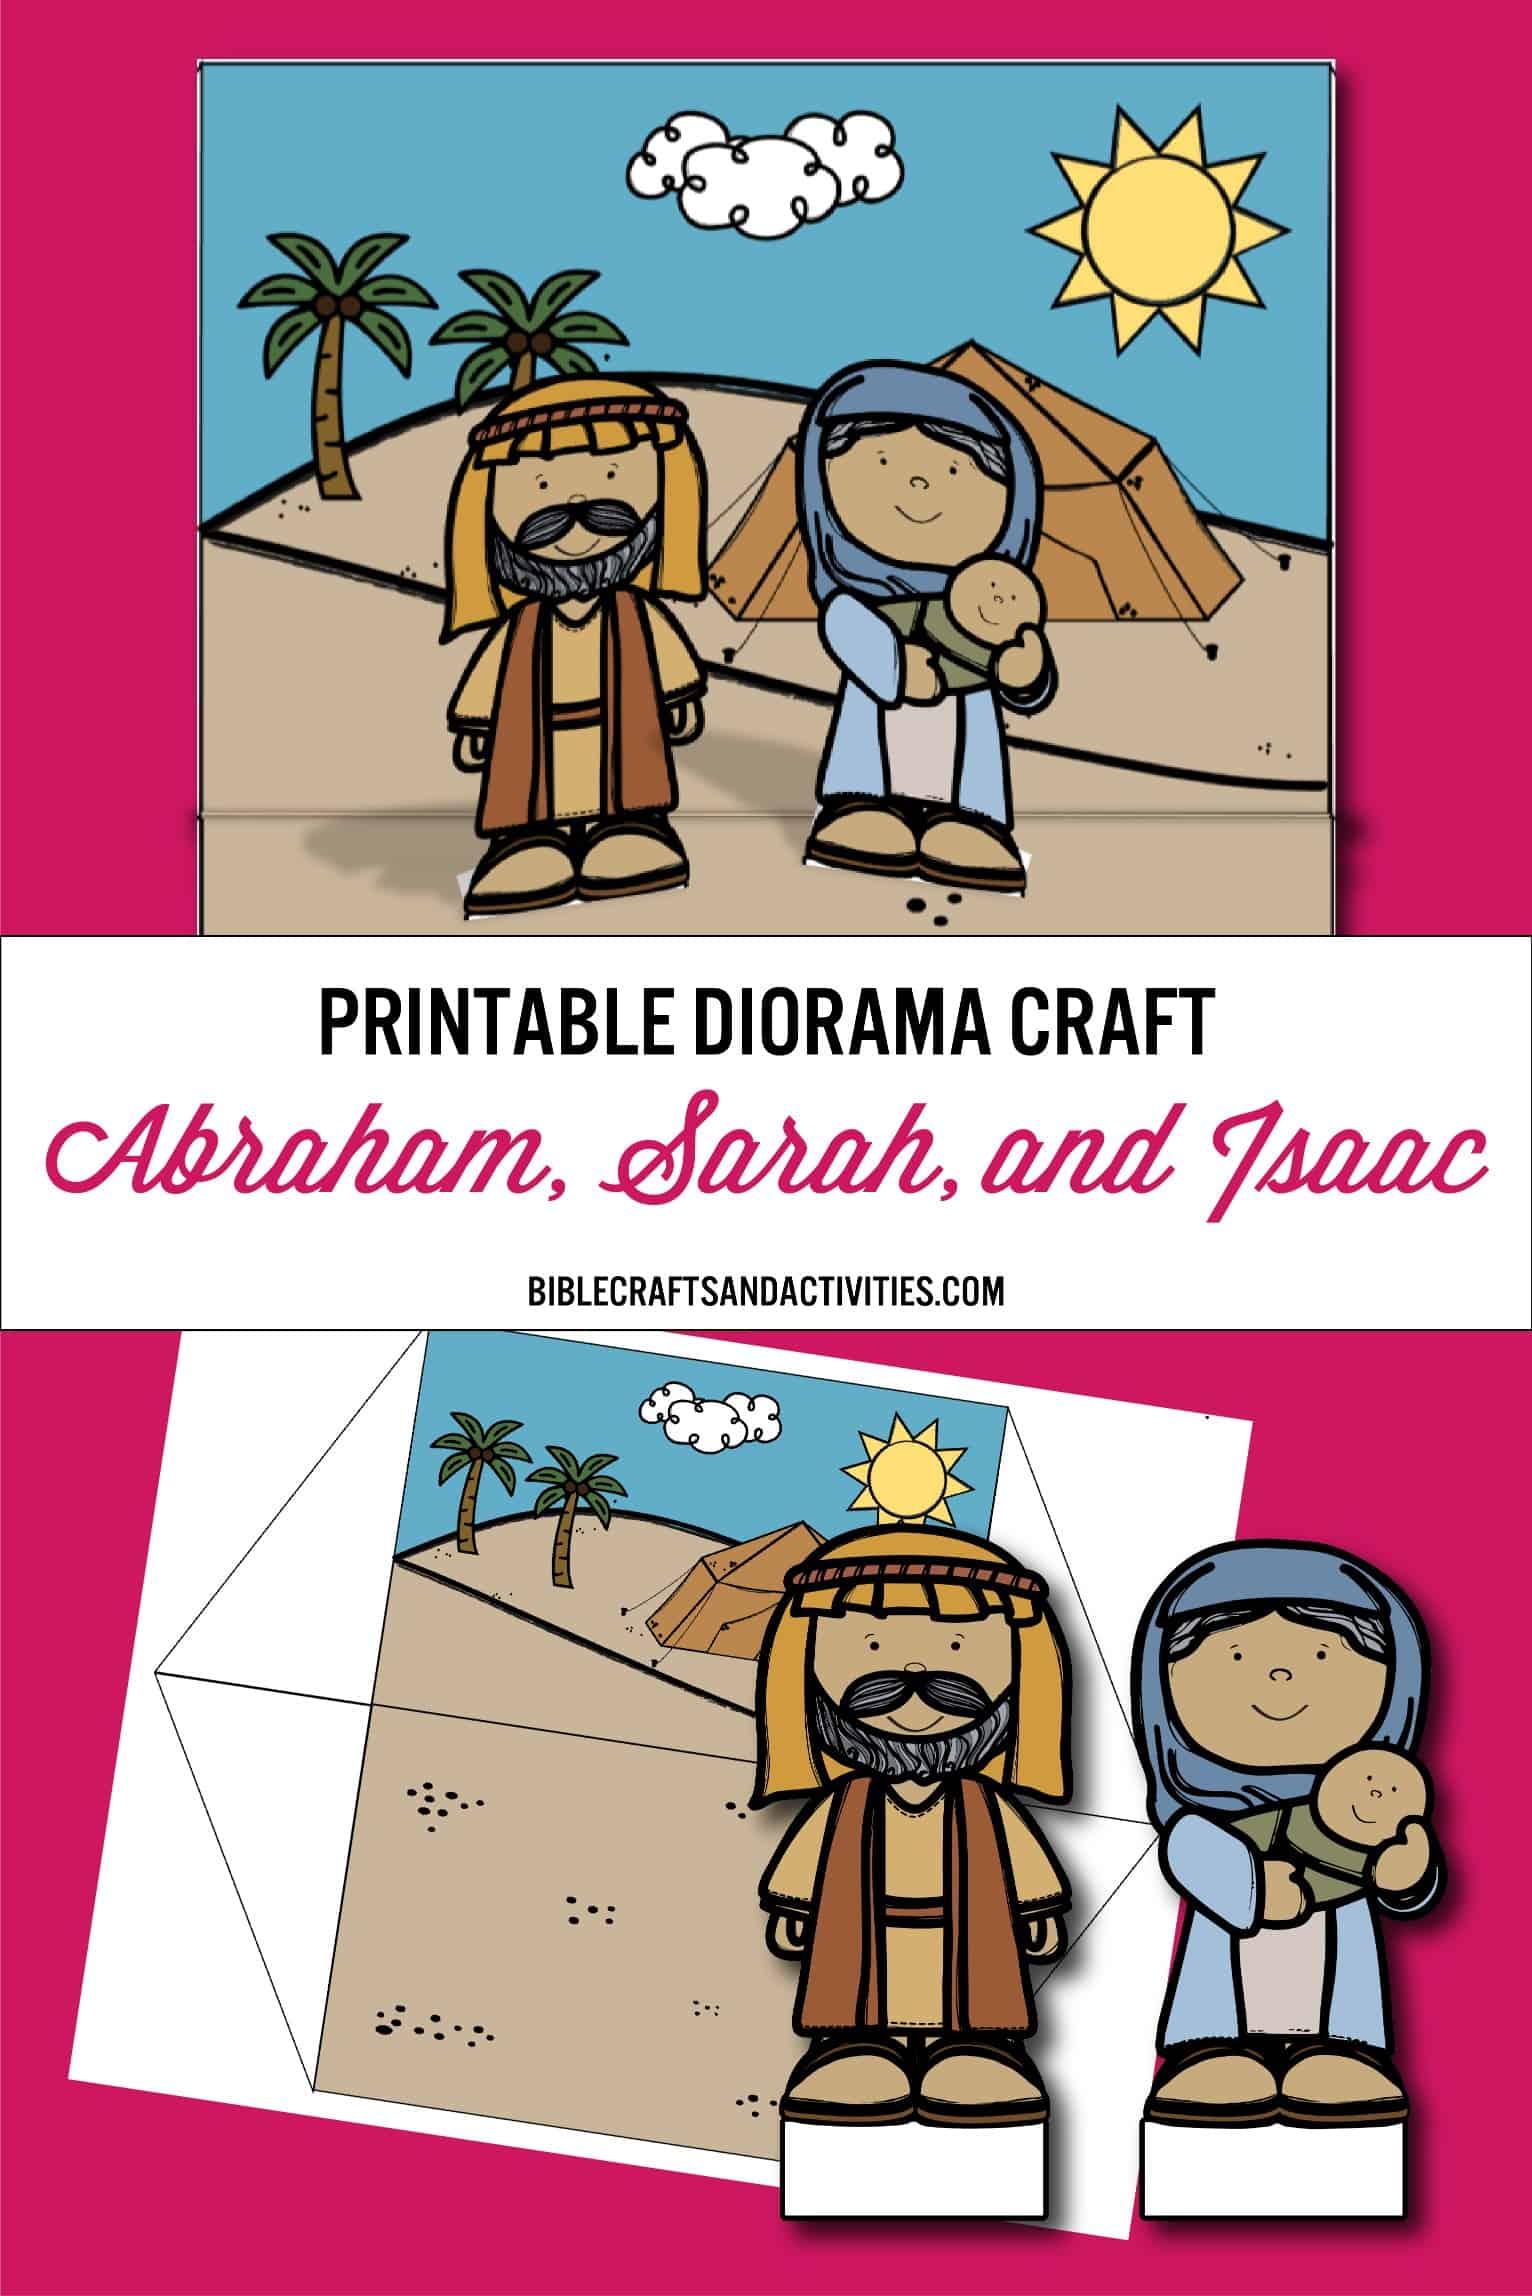 photo relating to Printable Diorama named pinterest-printable-diorama-craft-abraham-sarah-isaac